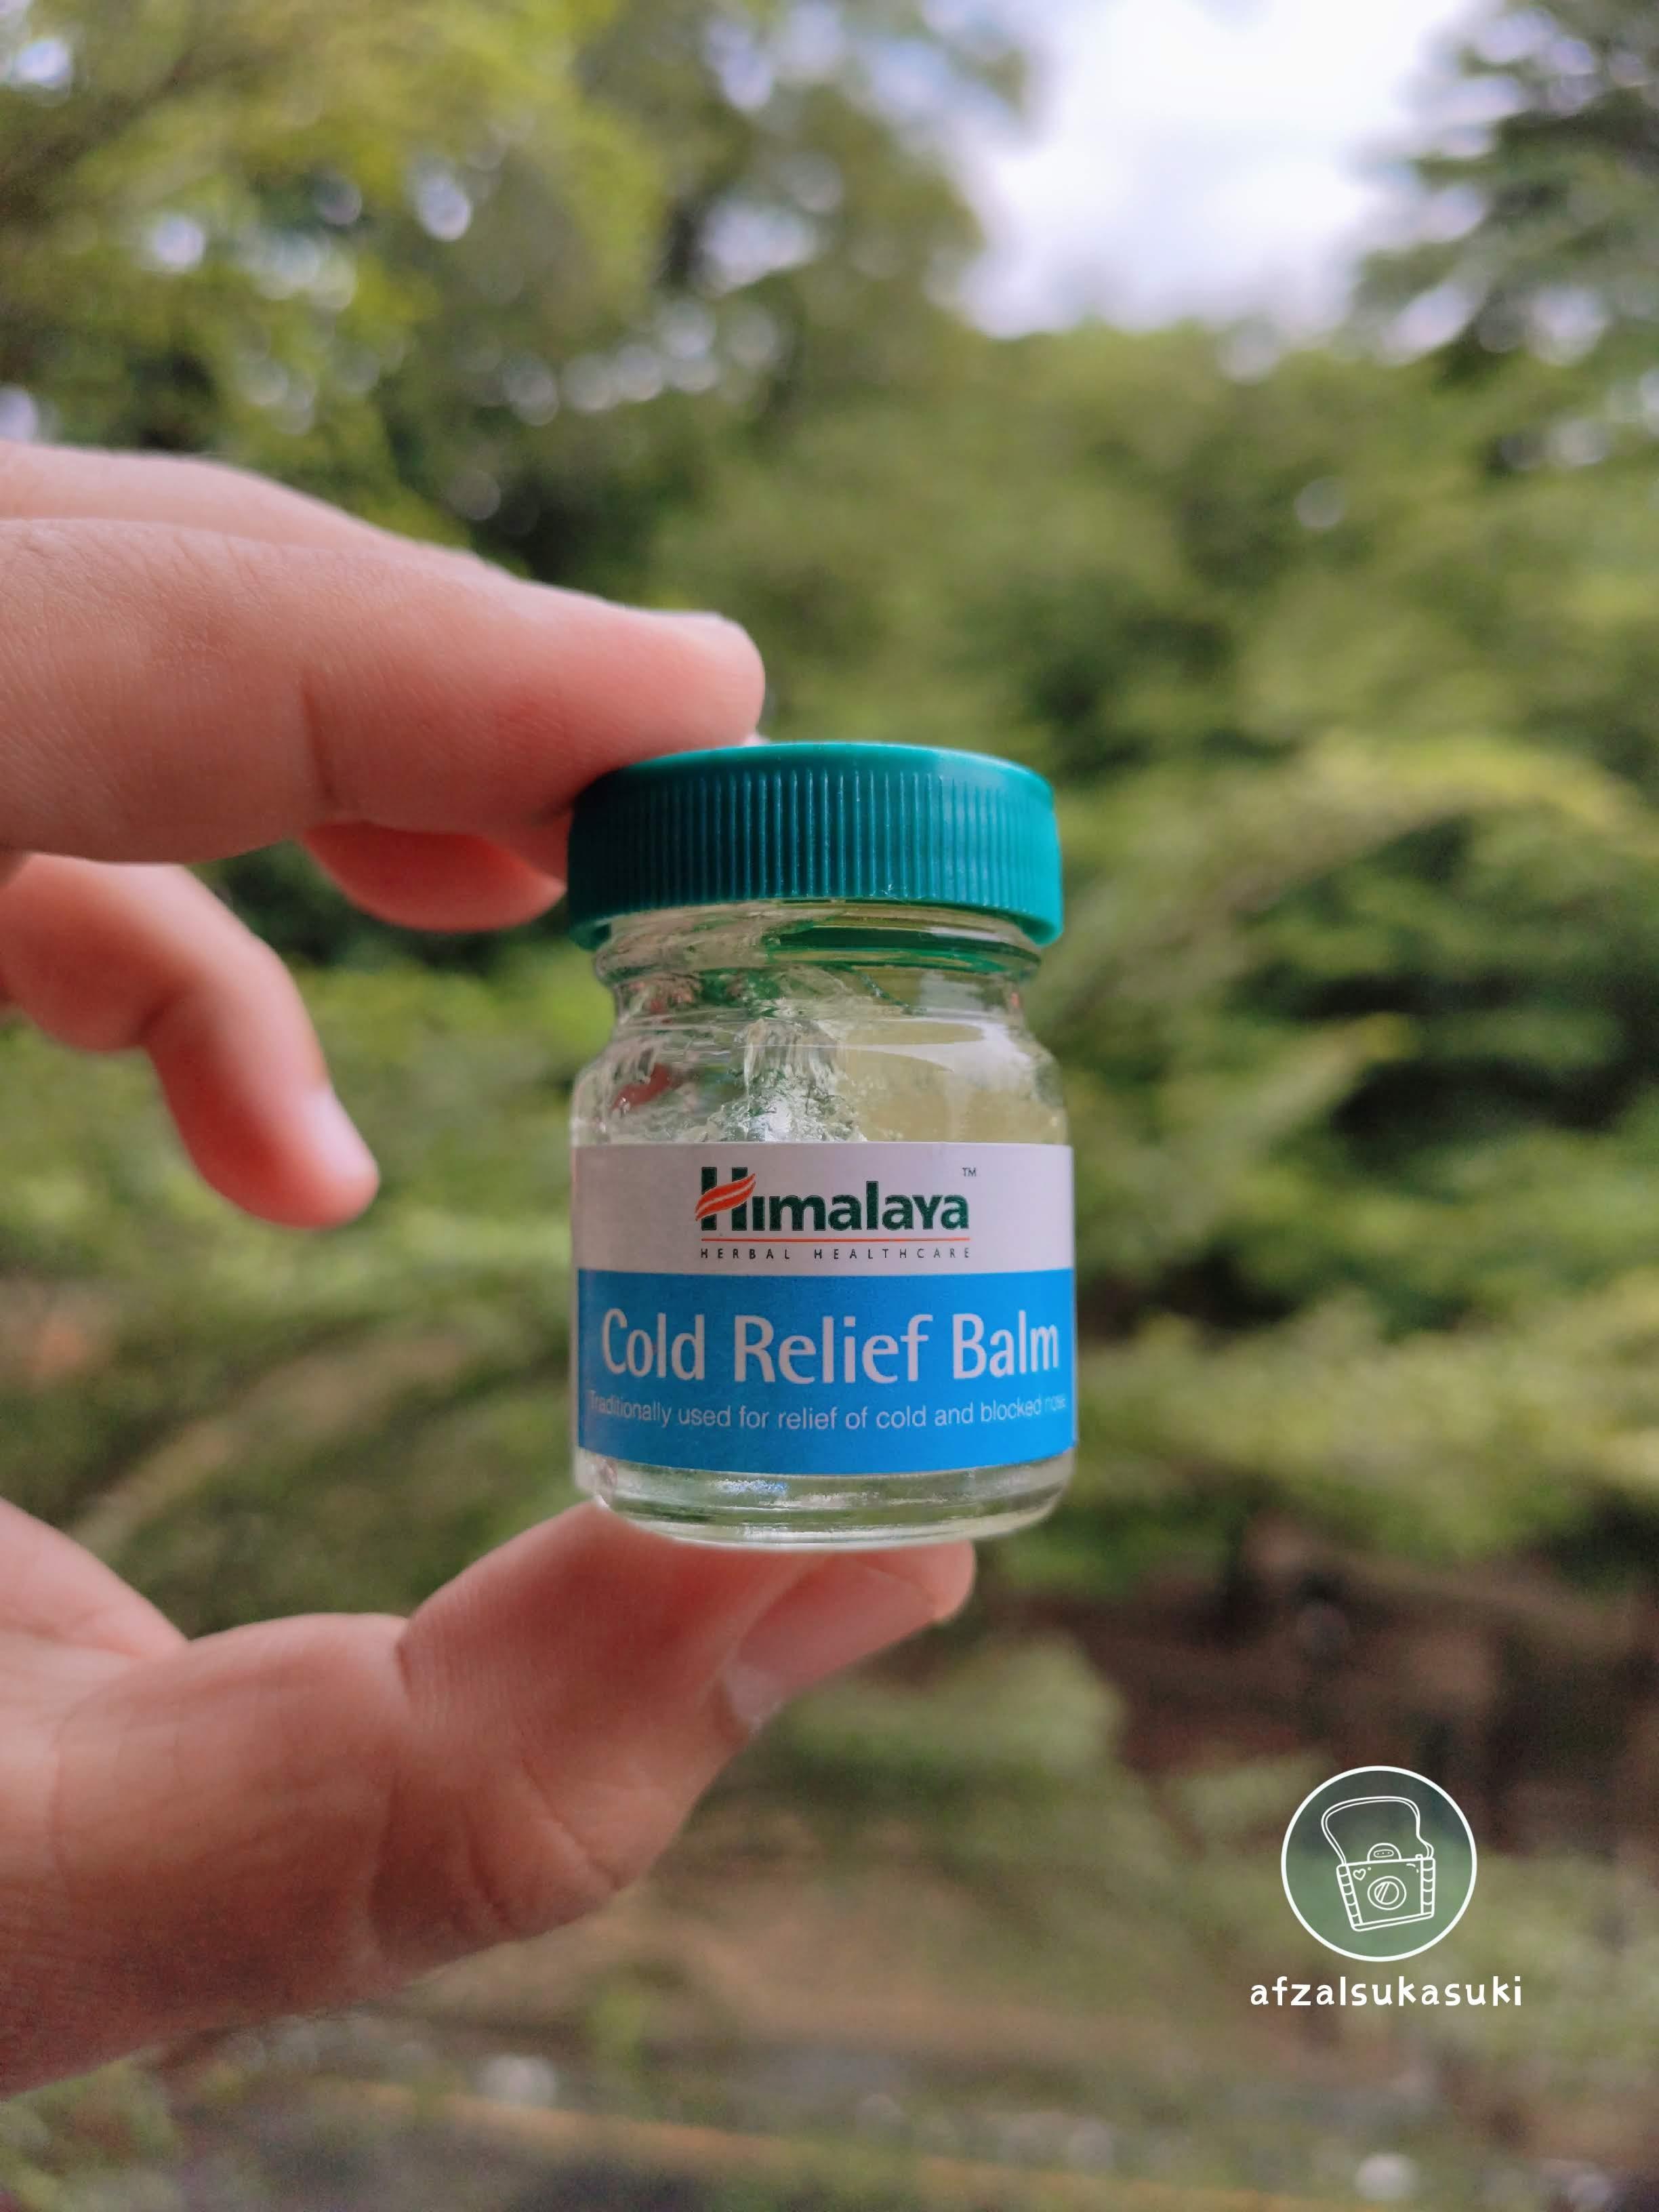 Himalaya Cold Relief Balm